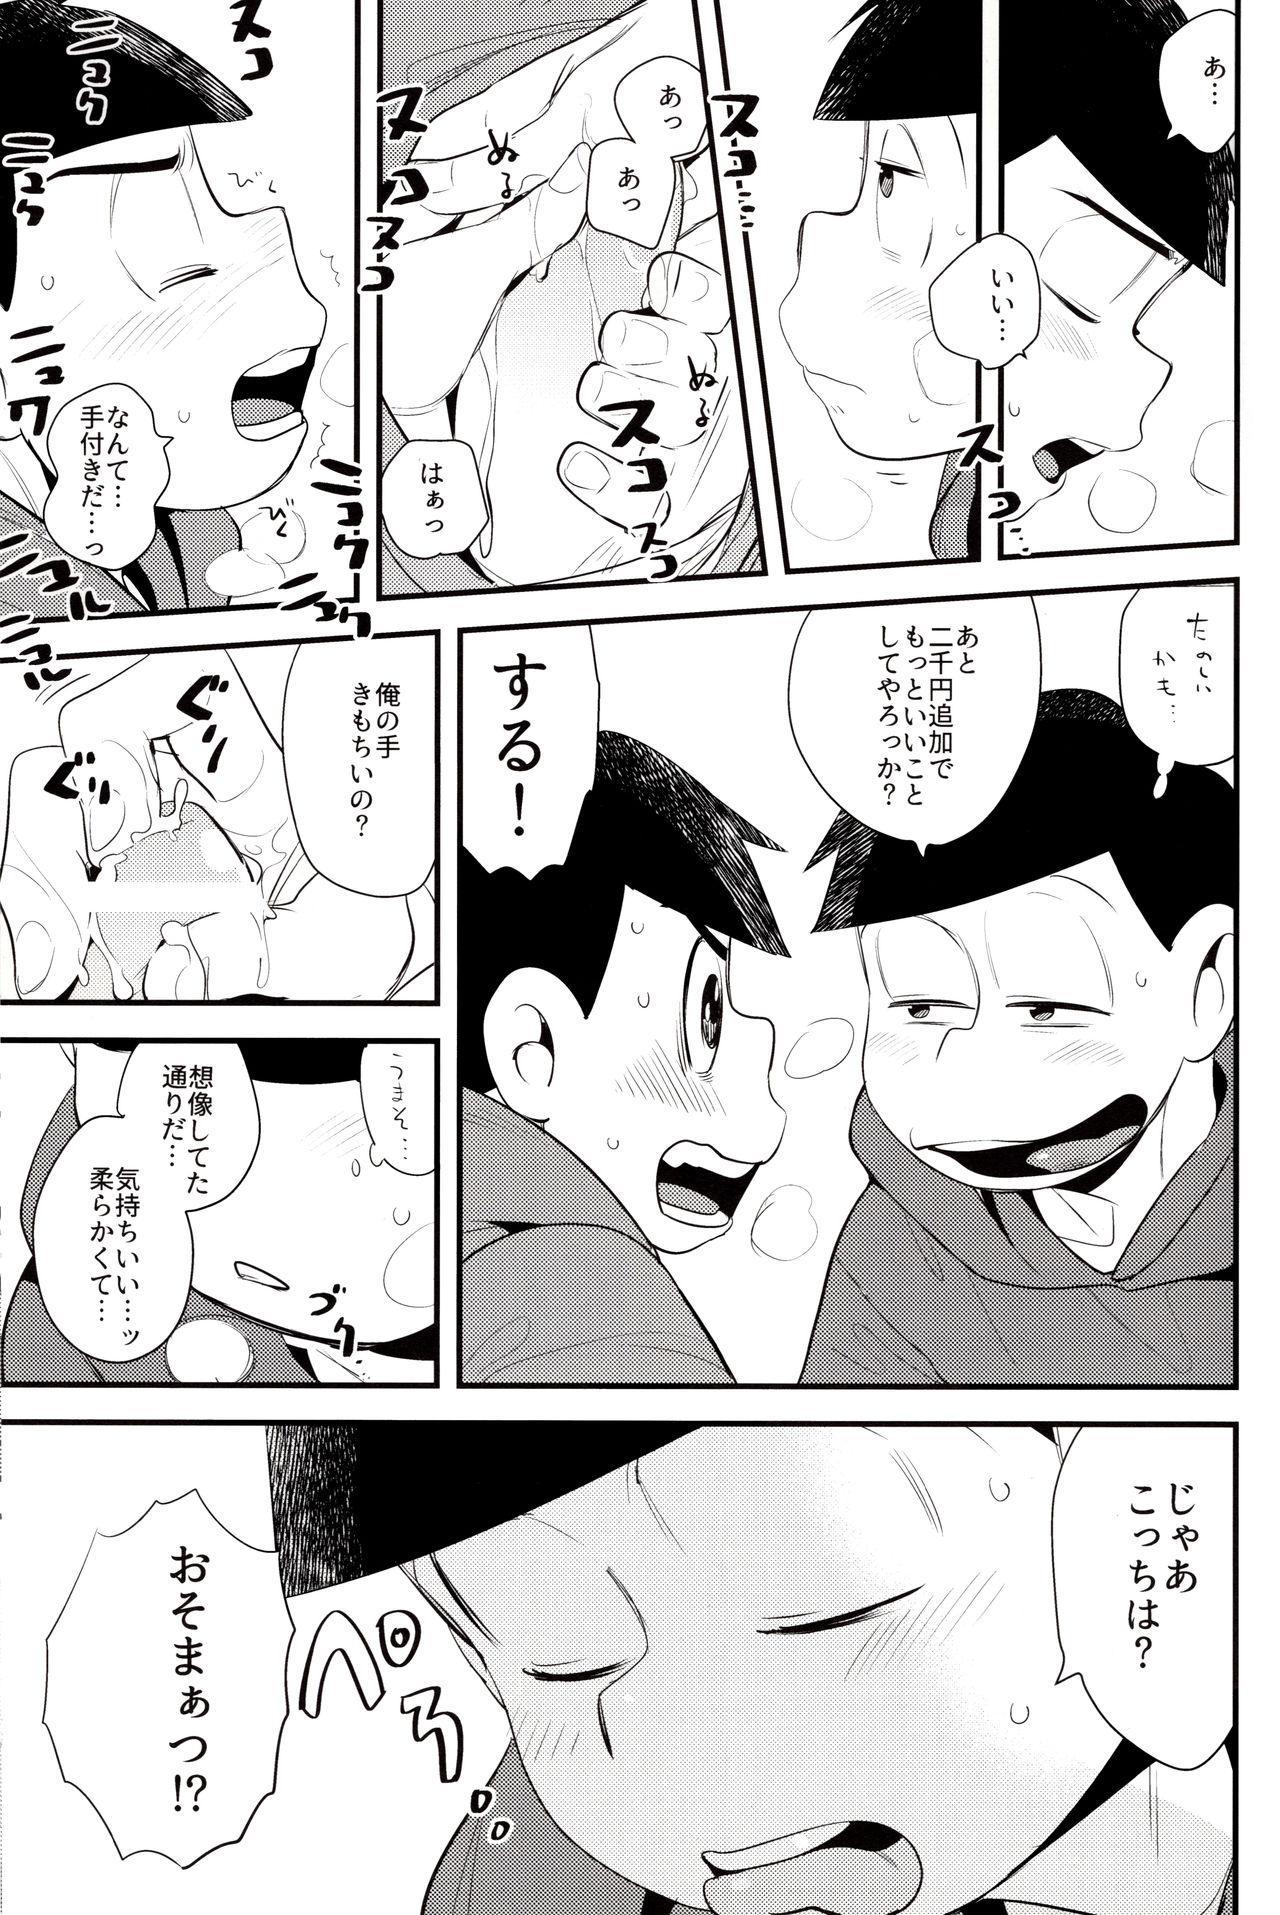 Onii-chan wa Uritai!! 4